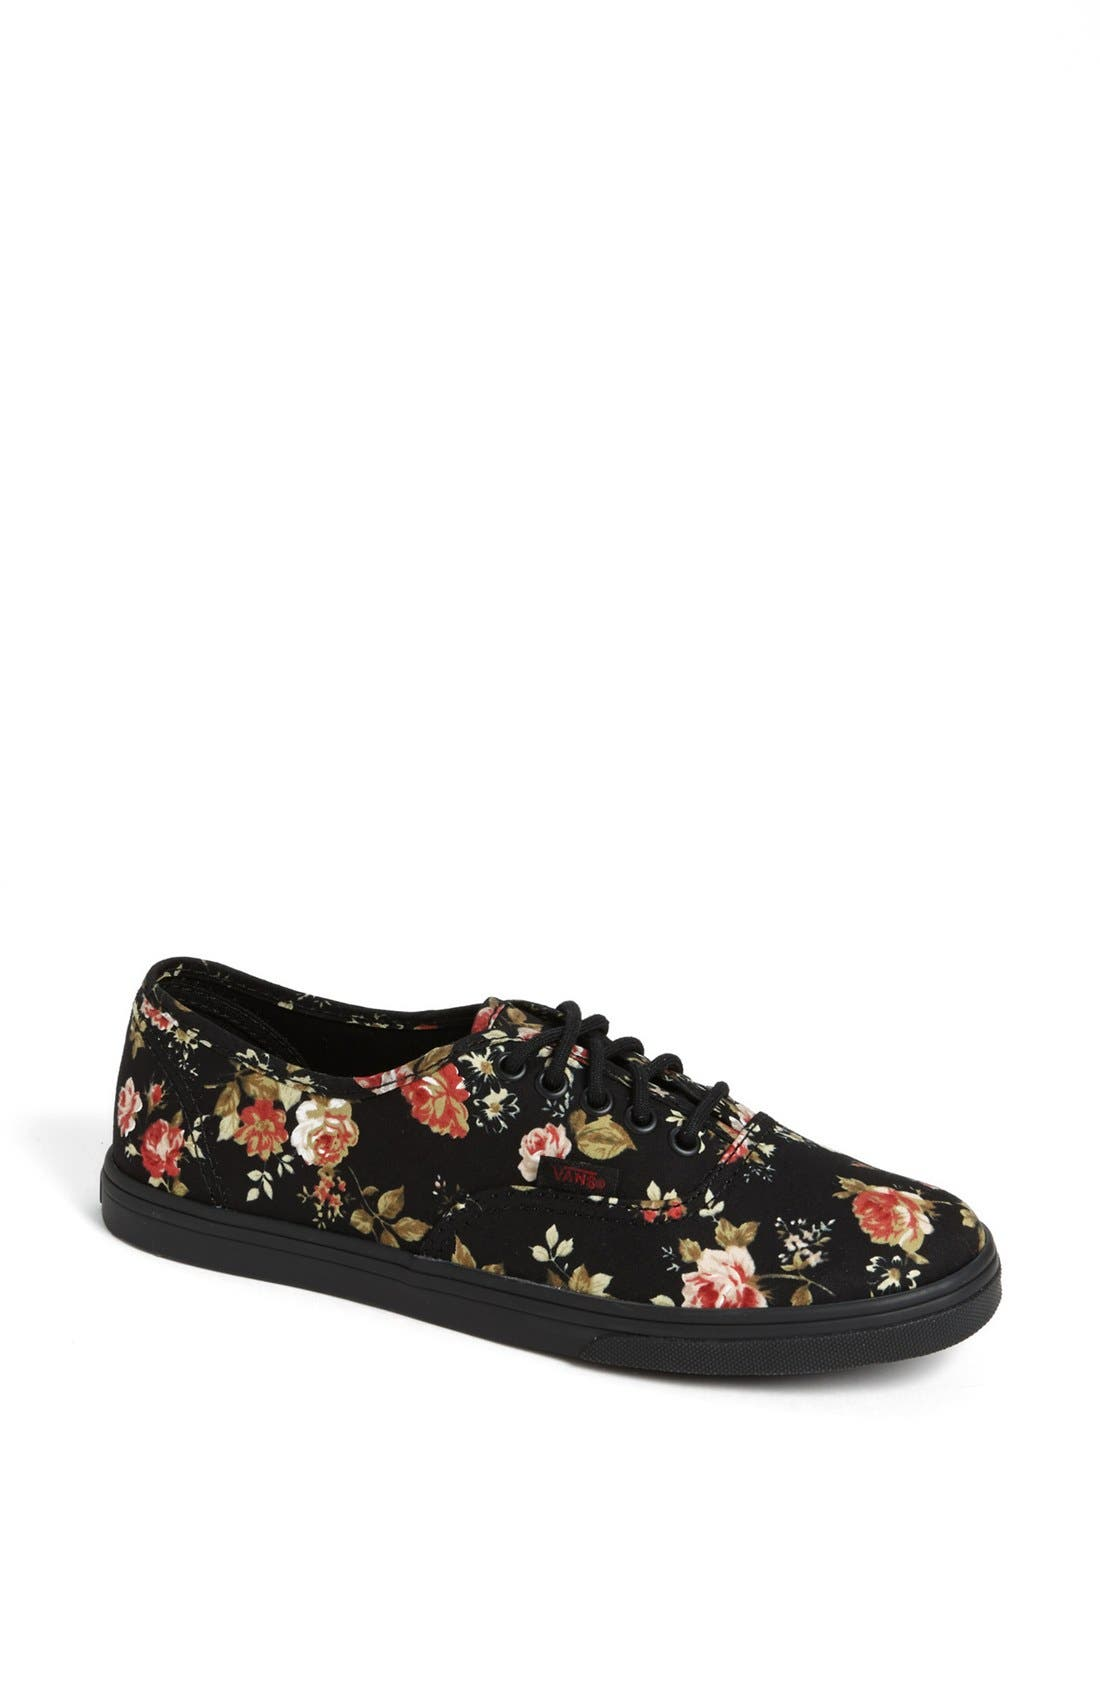 Alternate Image 1 Selected - Vans 'Authentic Lo Pro - Floral' Sneaker (Women)